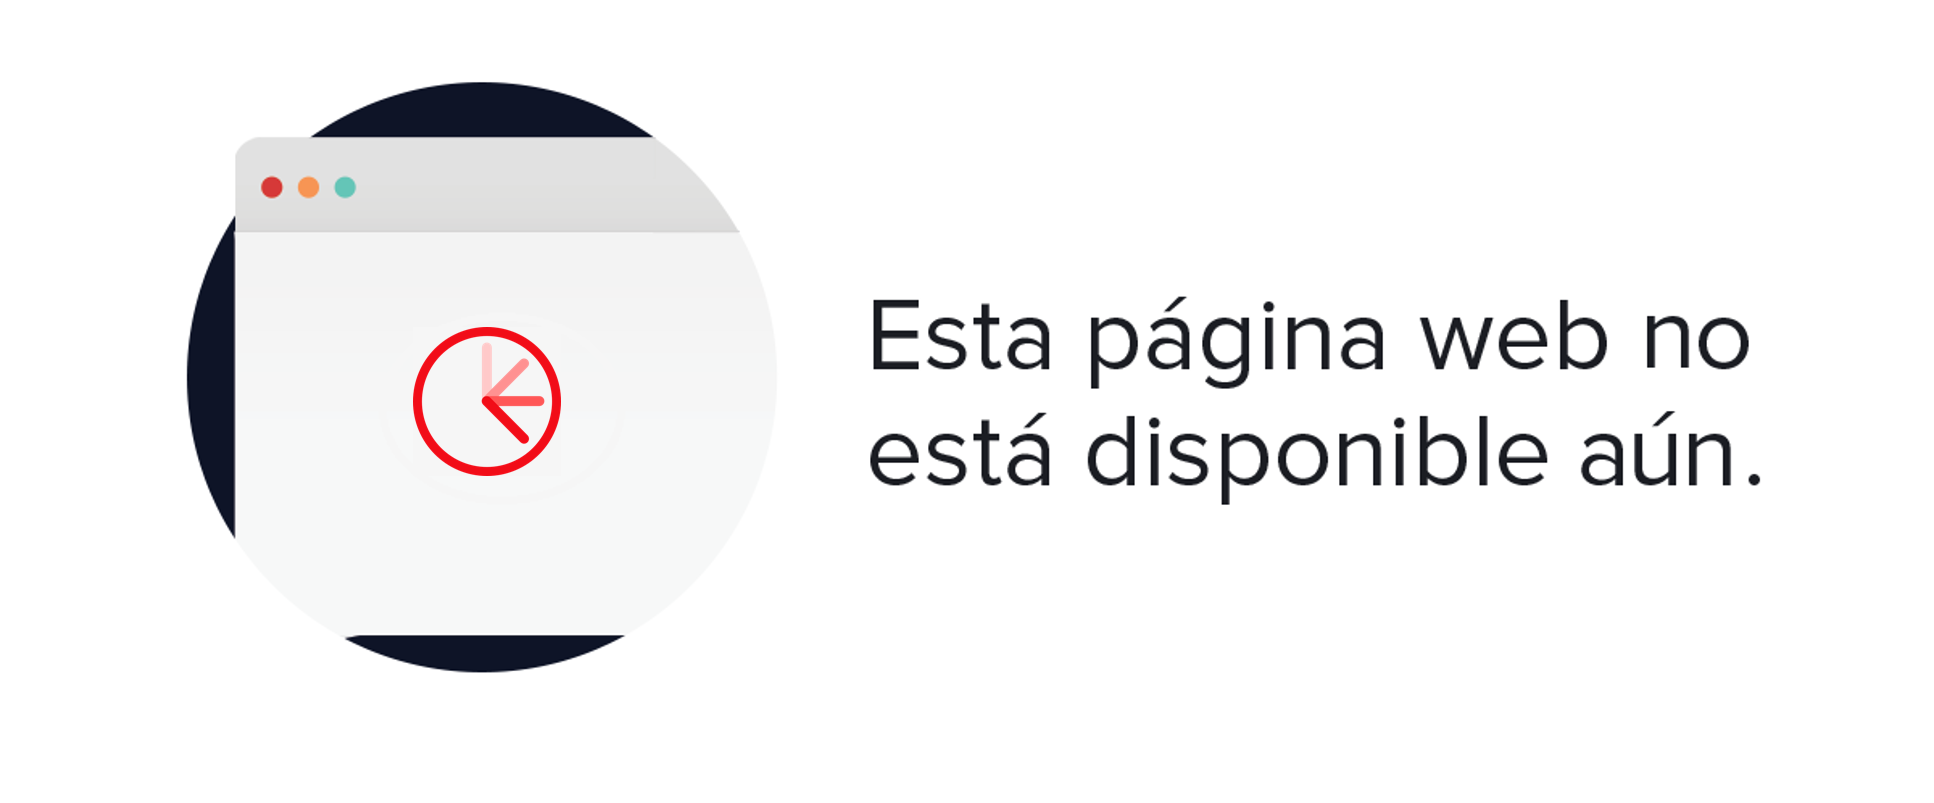 Adolfo Dominguez - Pantalón de mujer Adolfo Dominguez azul fluido Azul marino 8433917477504 - PLQRCTA